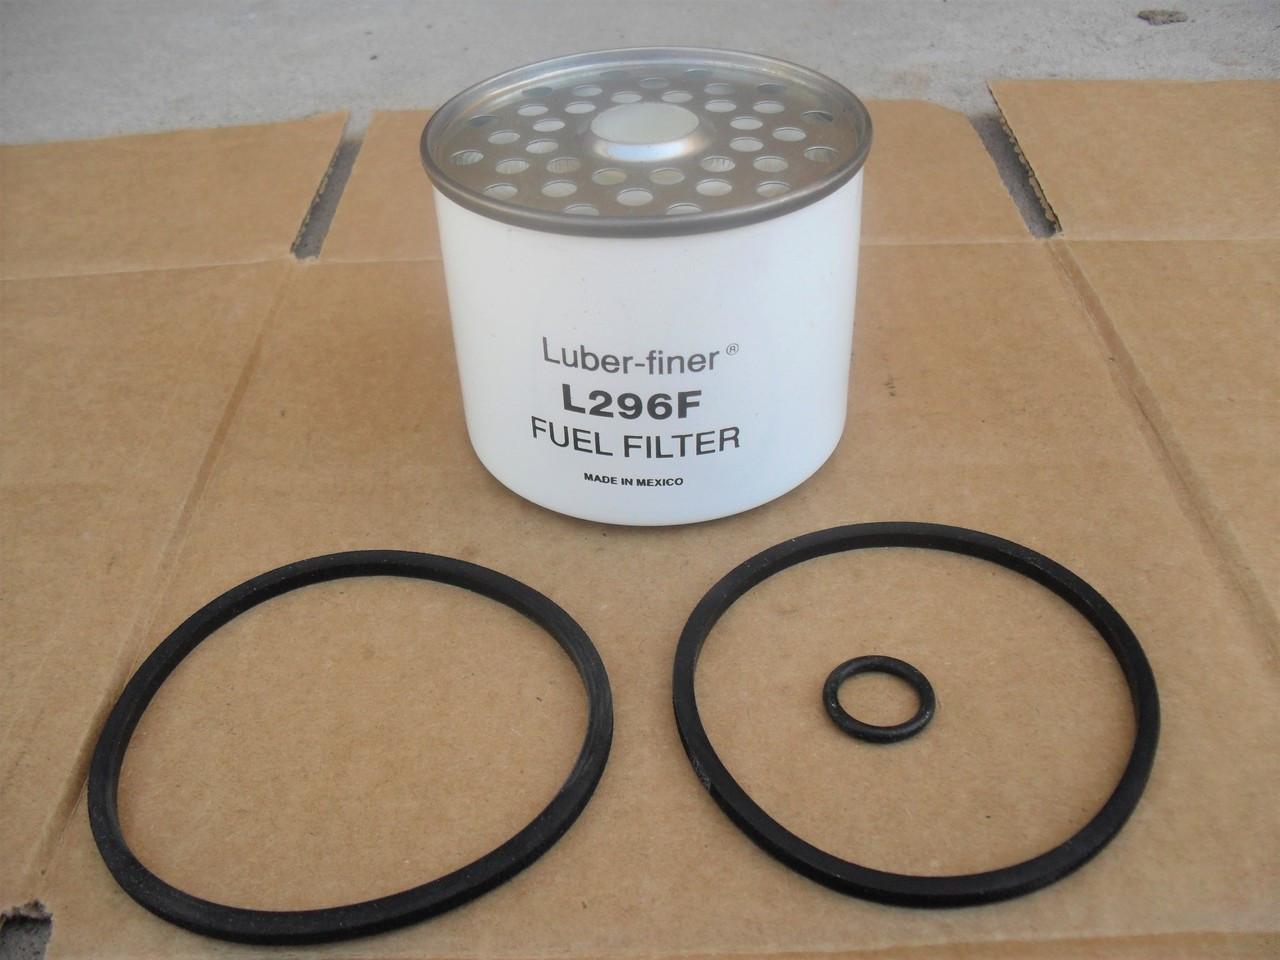 hight resolution of fuel filter for toro 335d 455 6500d reel master ground master 765220 76 5220 www lawnmowerpartstore com